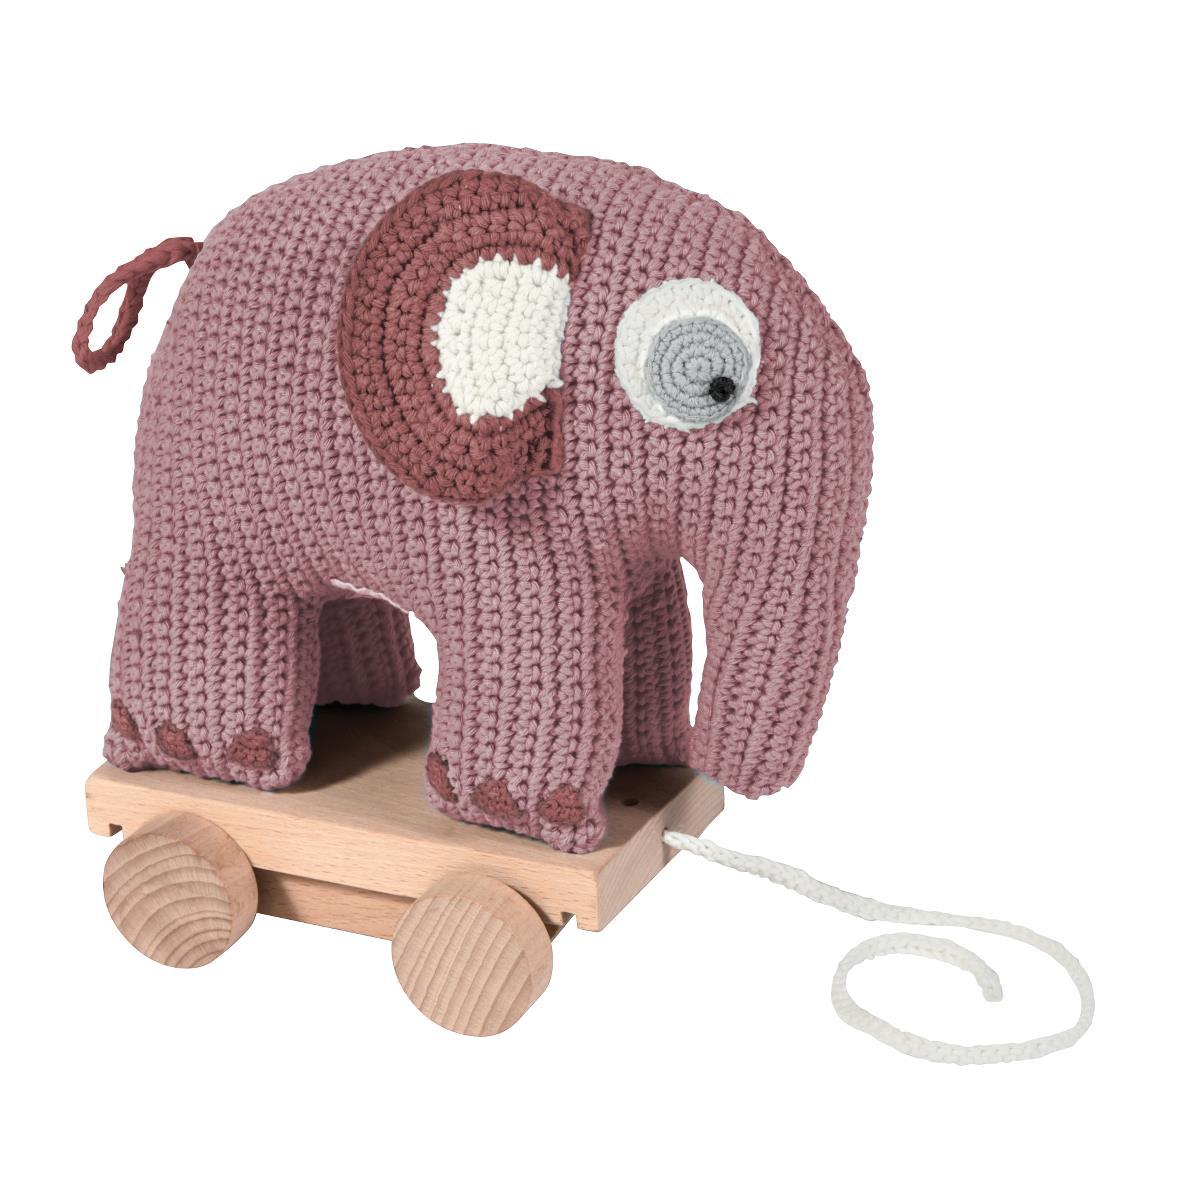 sebra Häkel-Nachziehtier, Elefant, altrosa 3001205 - 01